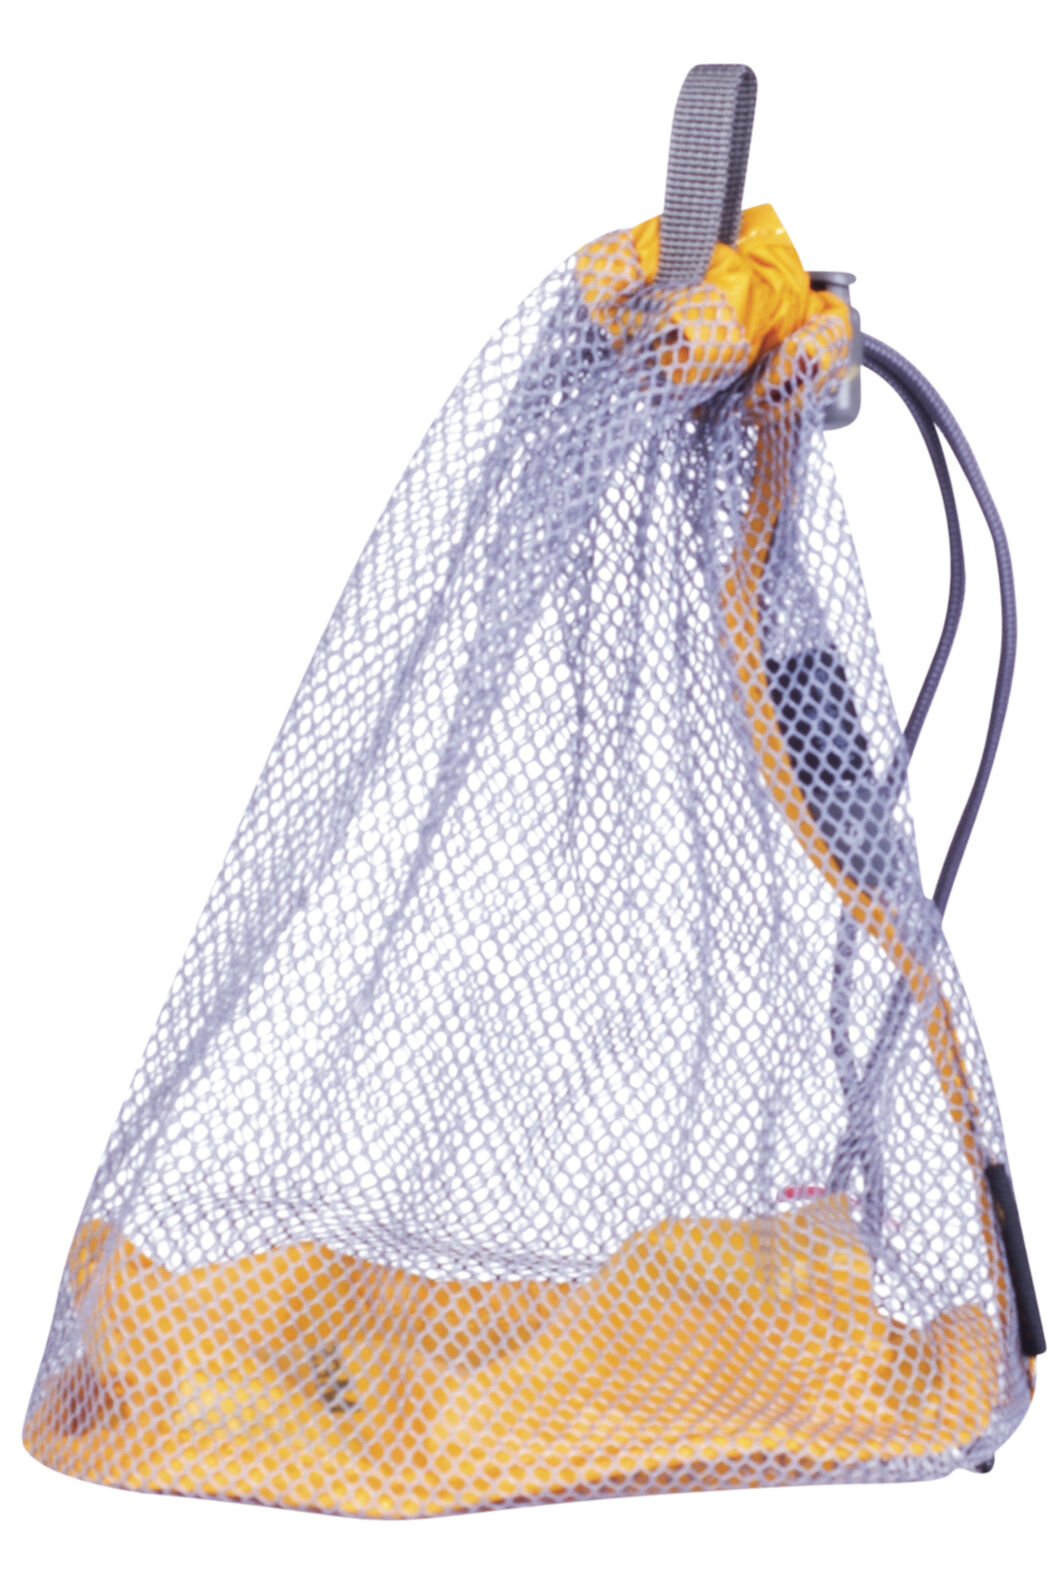 Macpac Mesh Stuff Sack XL, Saffron, hi-res